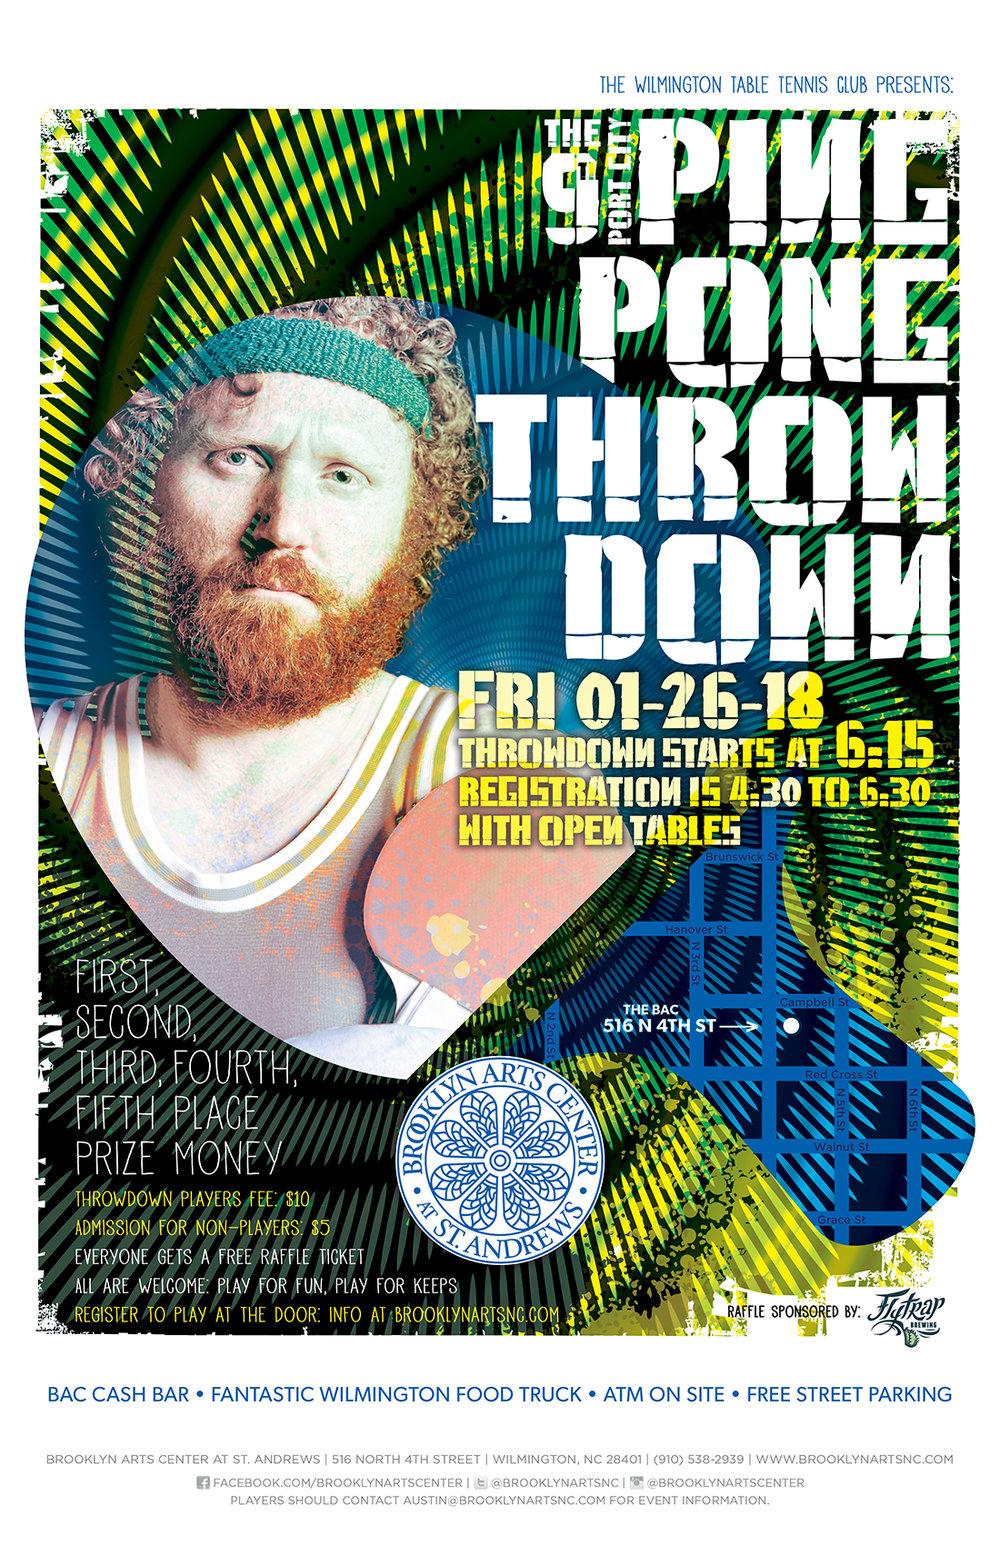 BAC_1998-ping pong throwdown 9.jpg